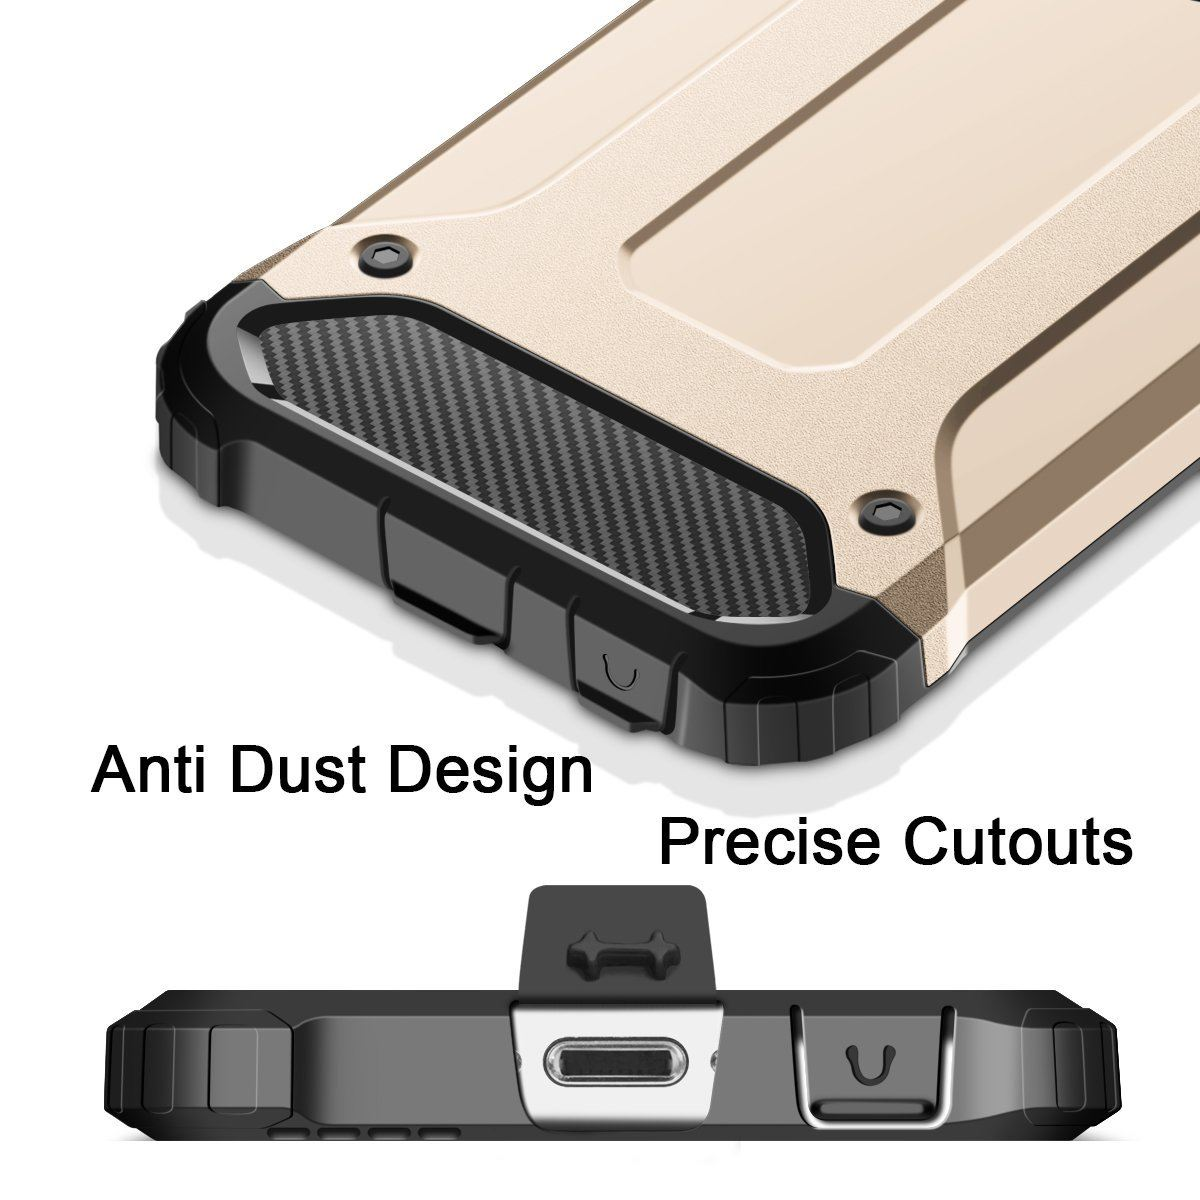 thumbnail 36 - For Apple iPhone 11 Pro Max XR Xs X 8 7 Plus 6 5 Se Case Cover Impact Heavy Duty